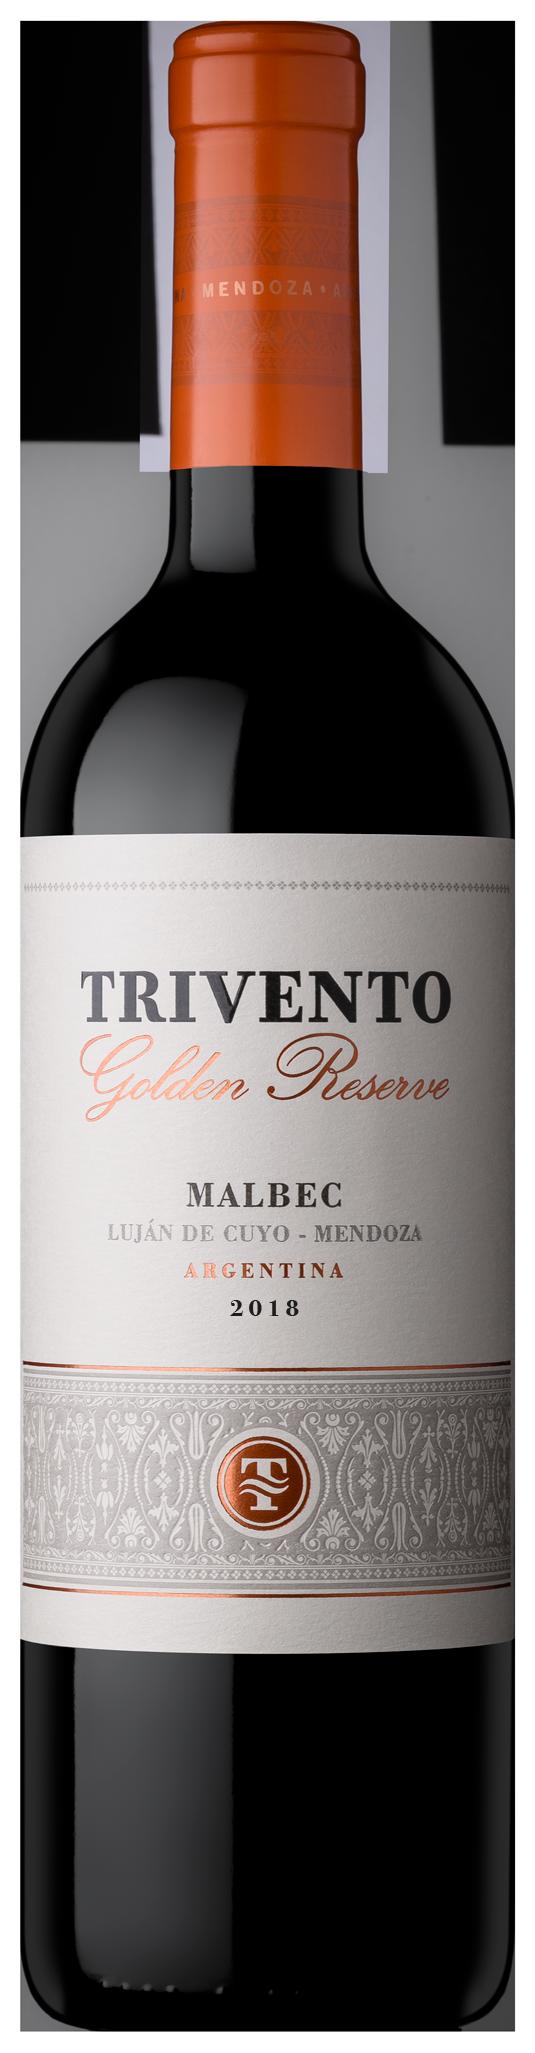 Trivento Golden Reserve – Vino tinto Malbec 750ml.